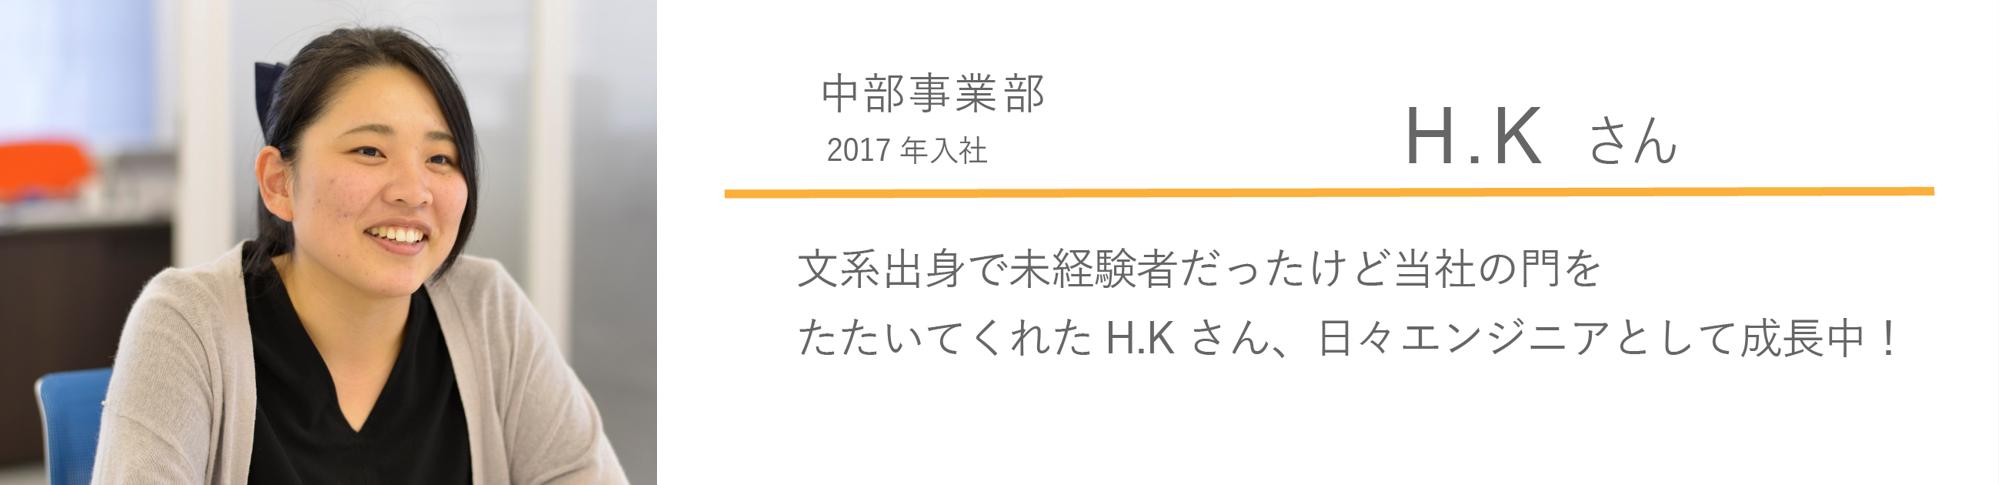 社員紹介7